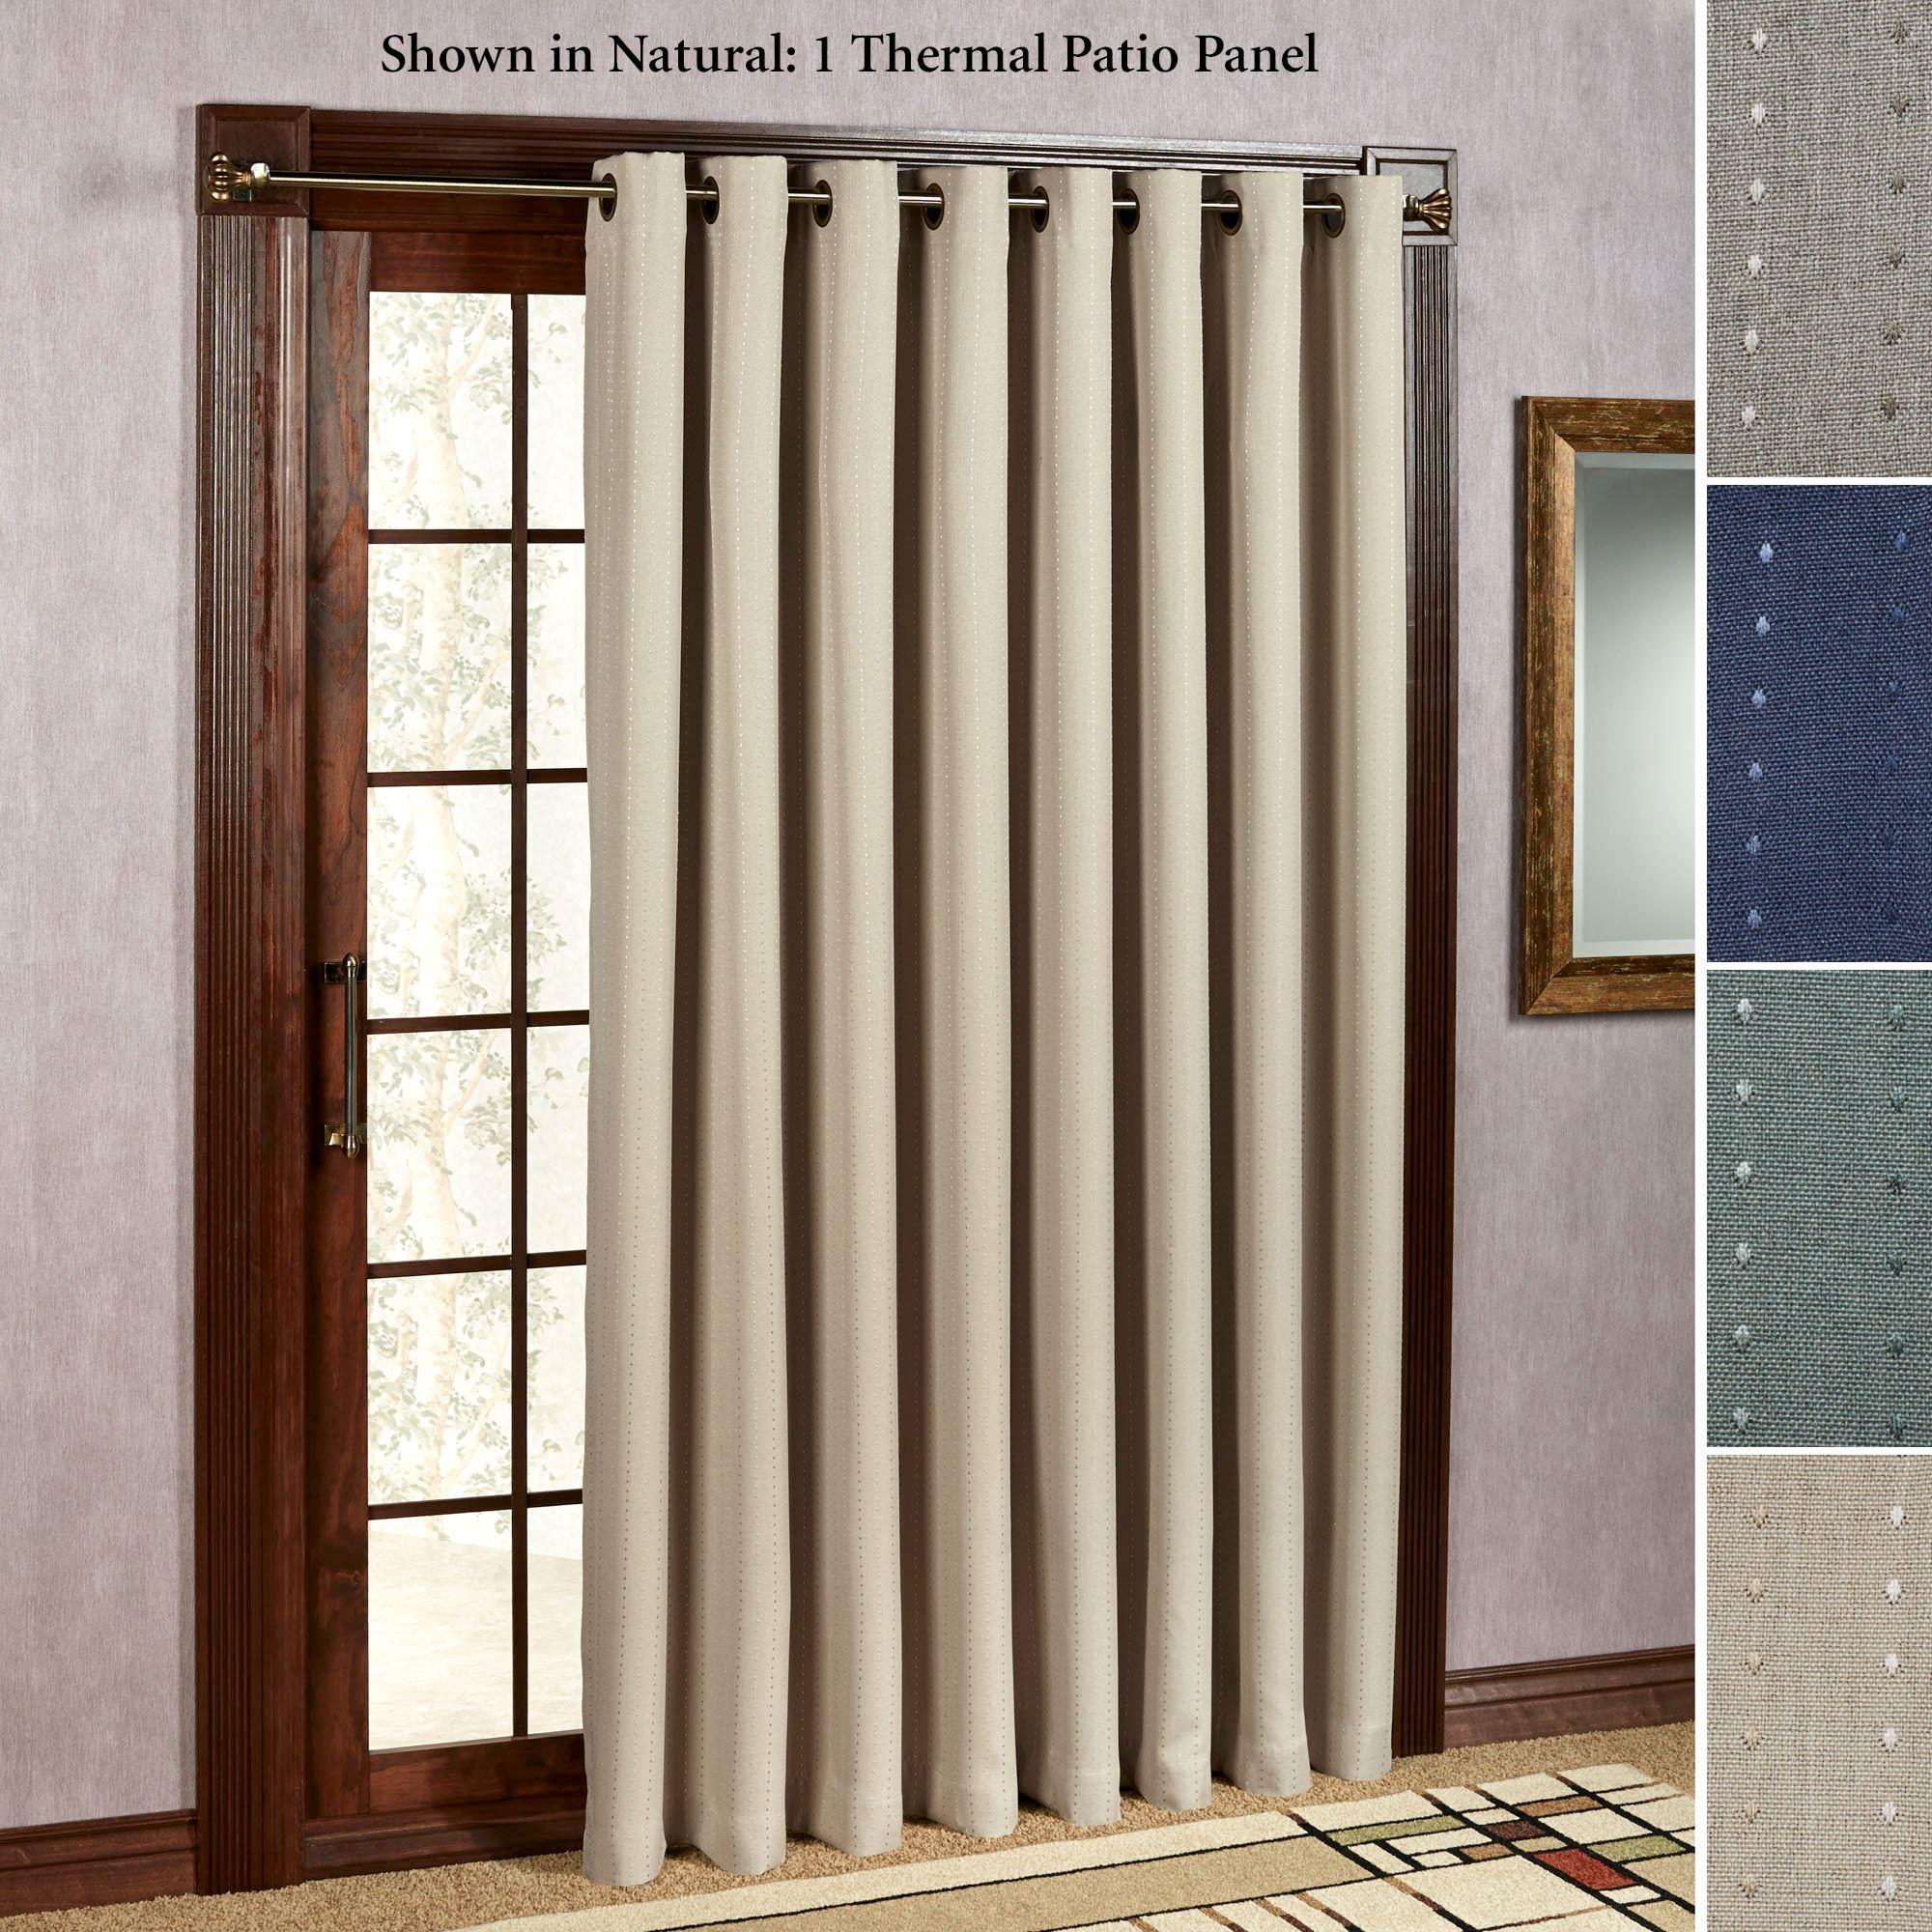 Thermal Drapes Sliding Glass Doorsgrand pointe room darkening thermal grommet patio panel